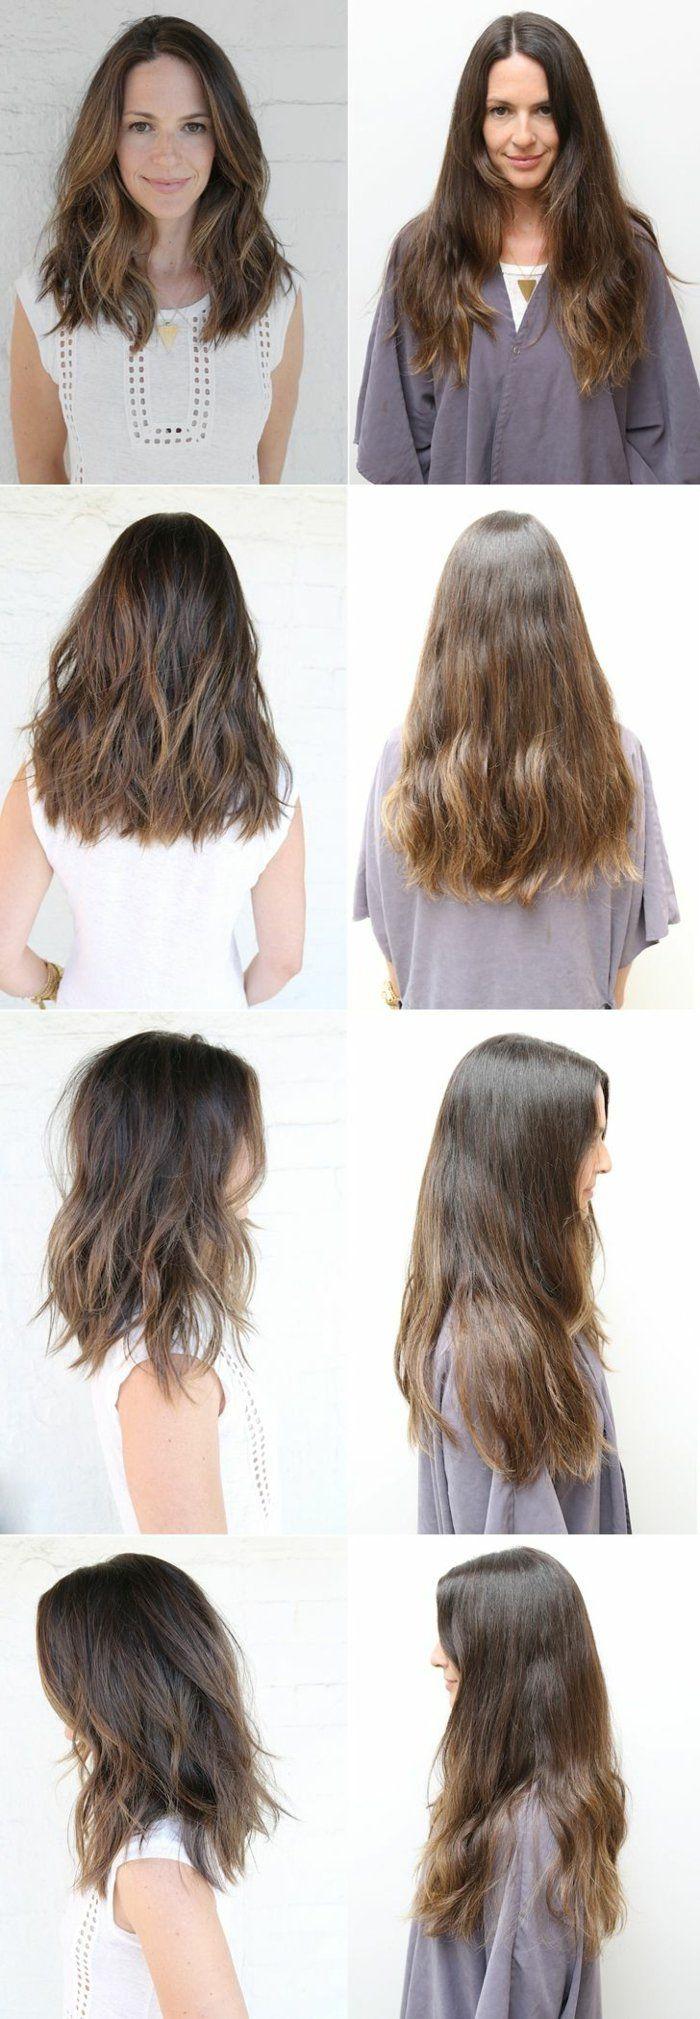 Coupe Cheveux Long Degrade Femme